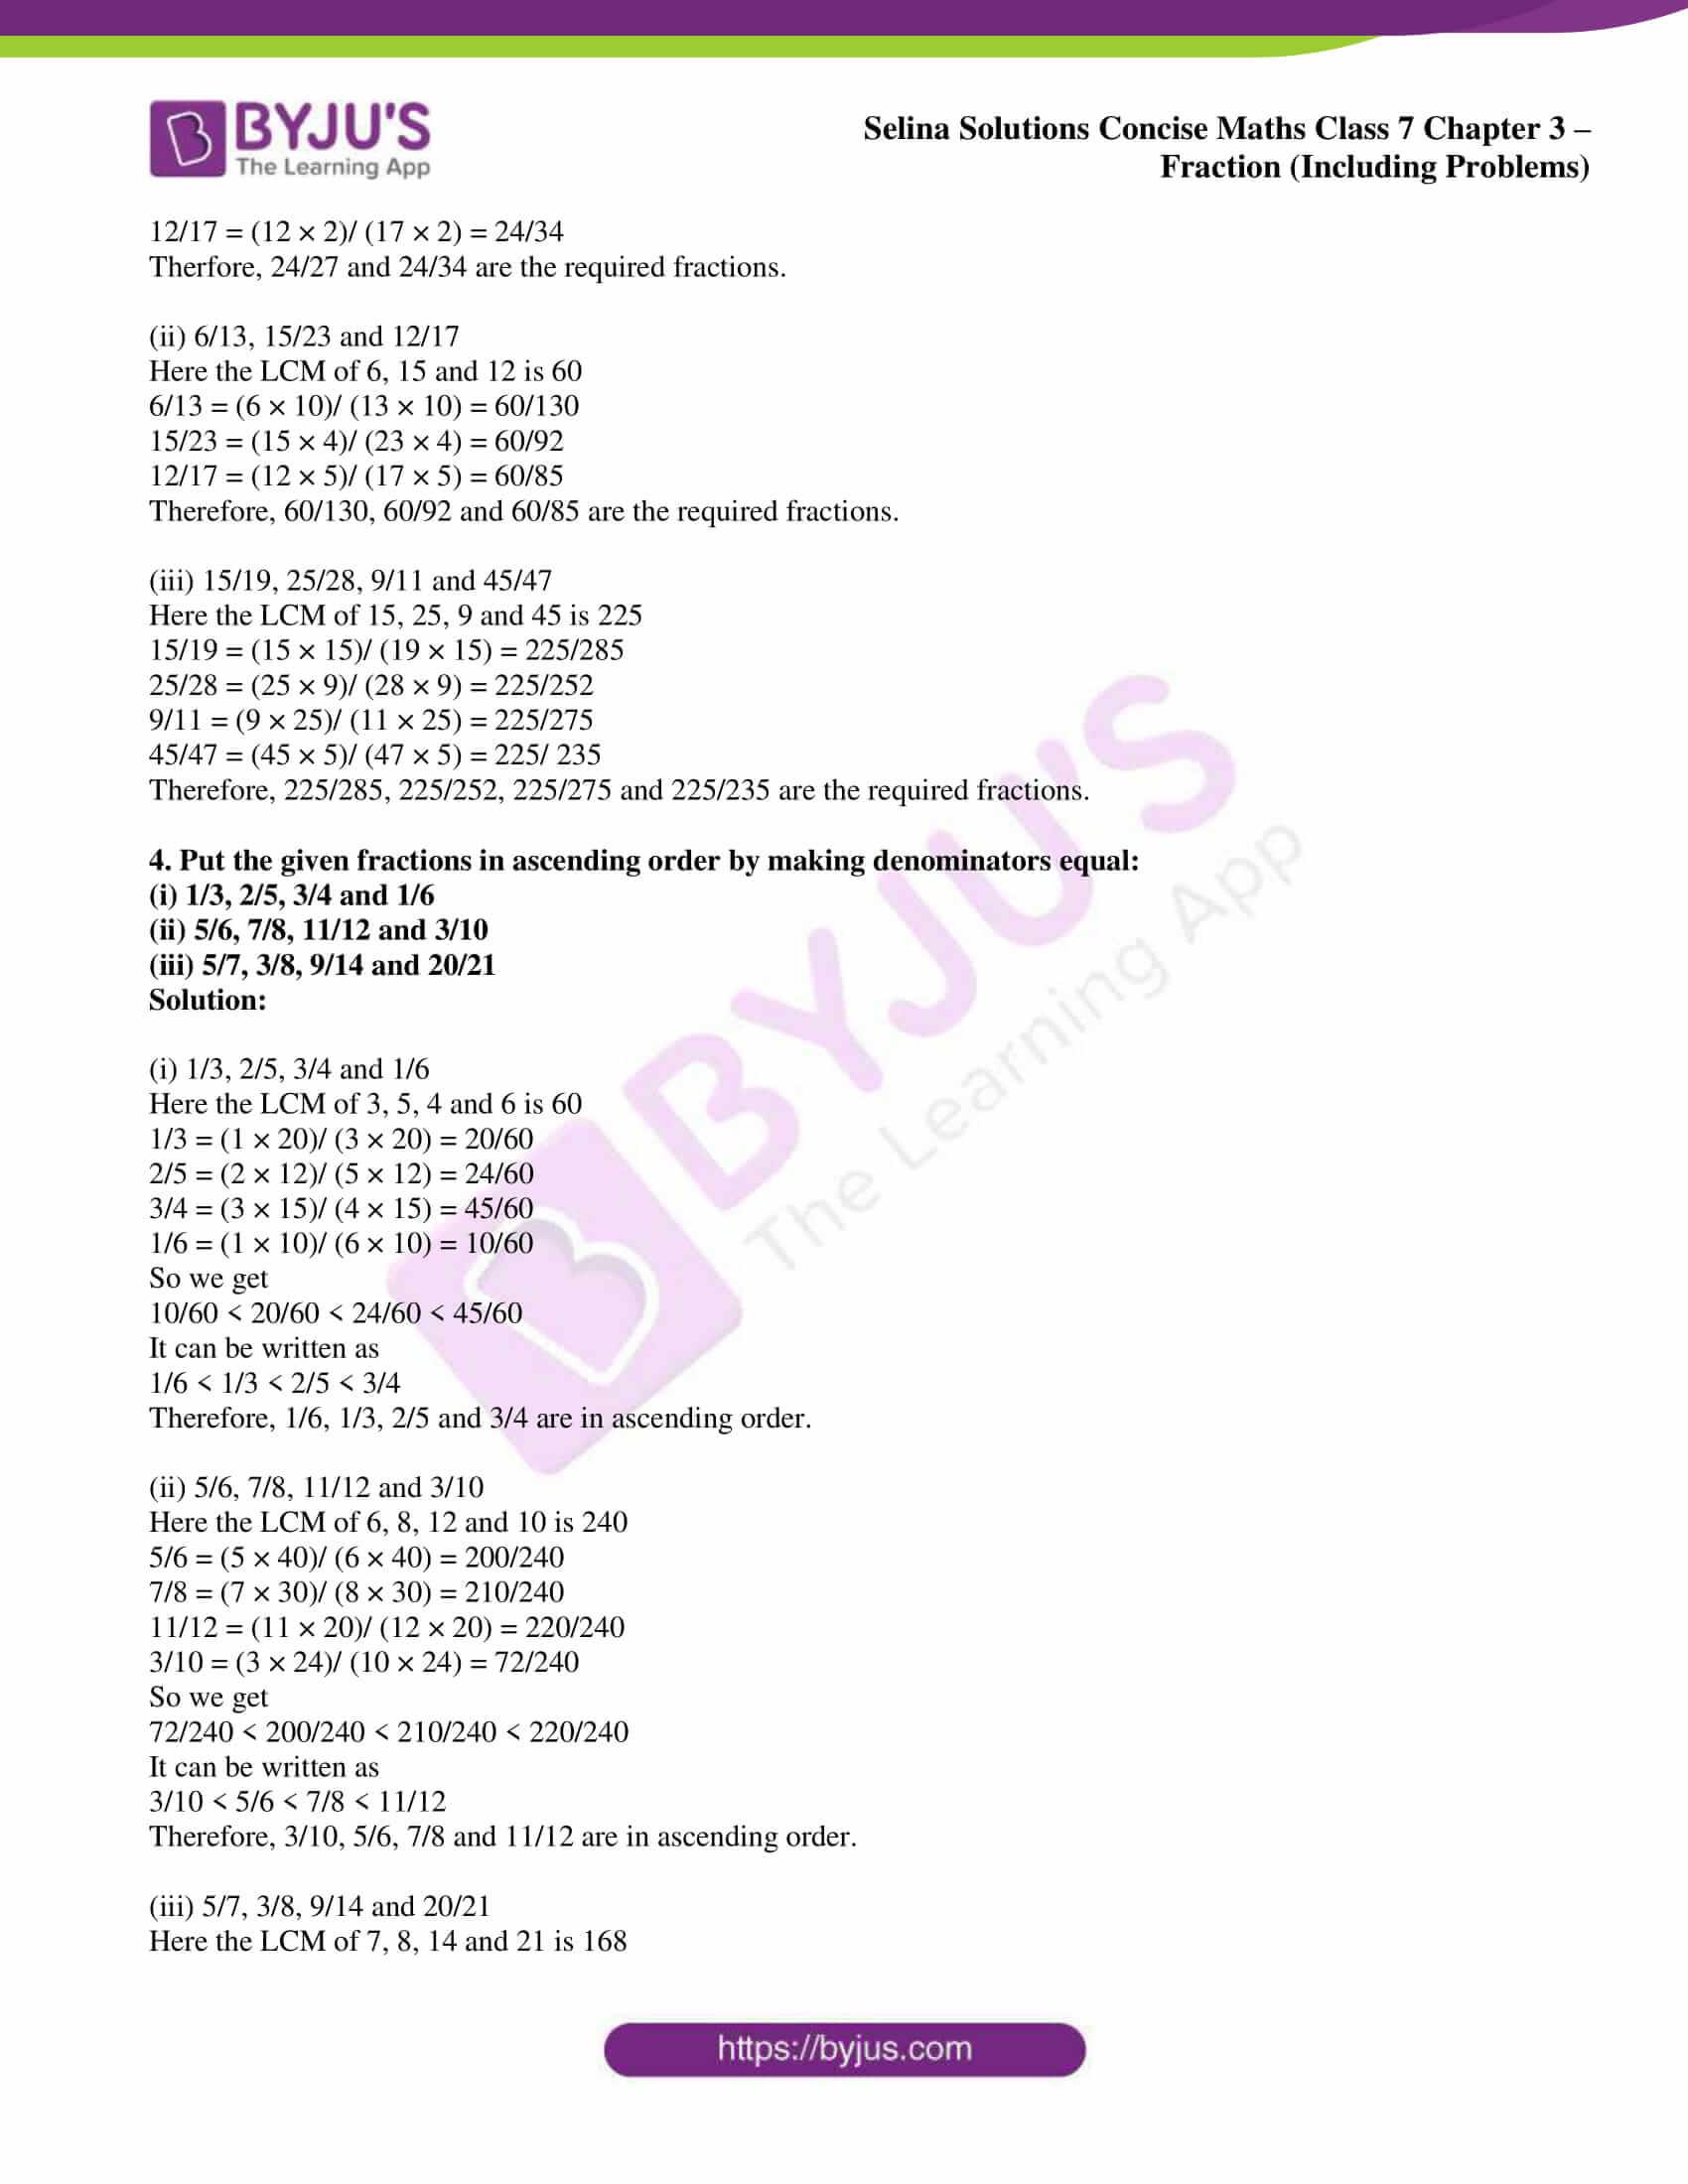 selina sol concise maths class 7 ch3 ex 3b 2